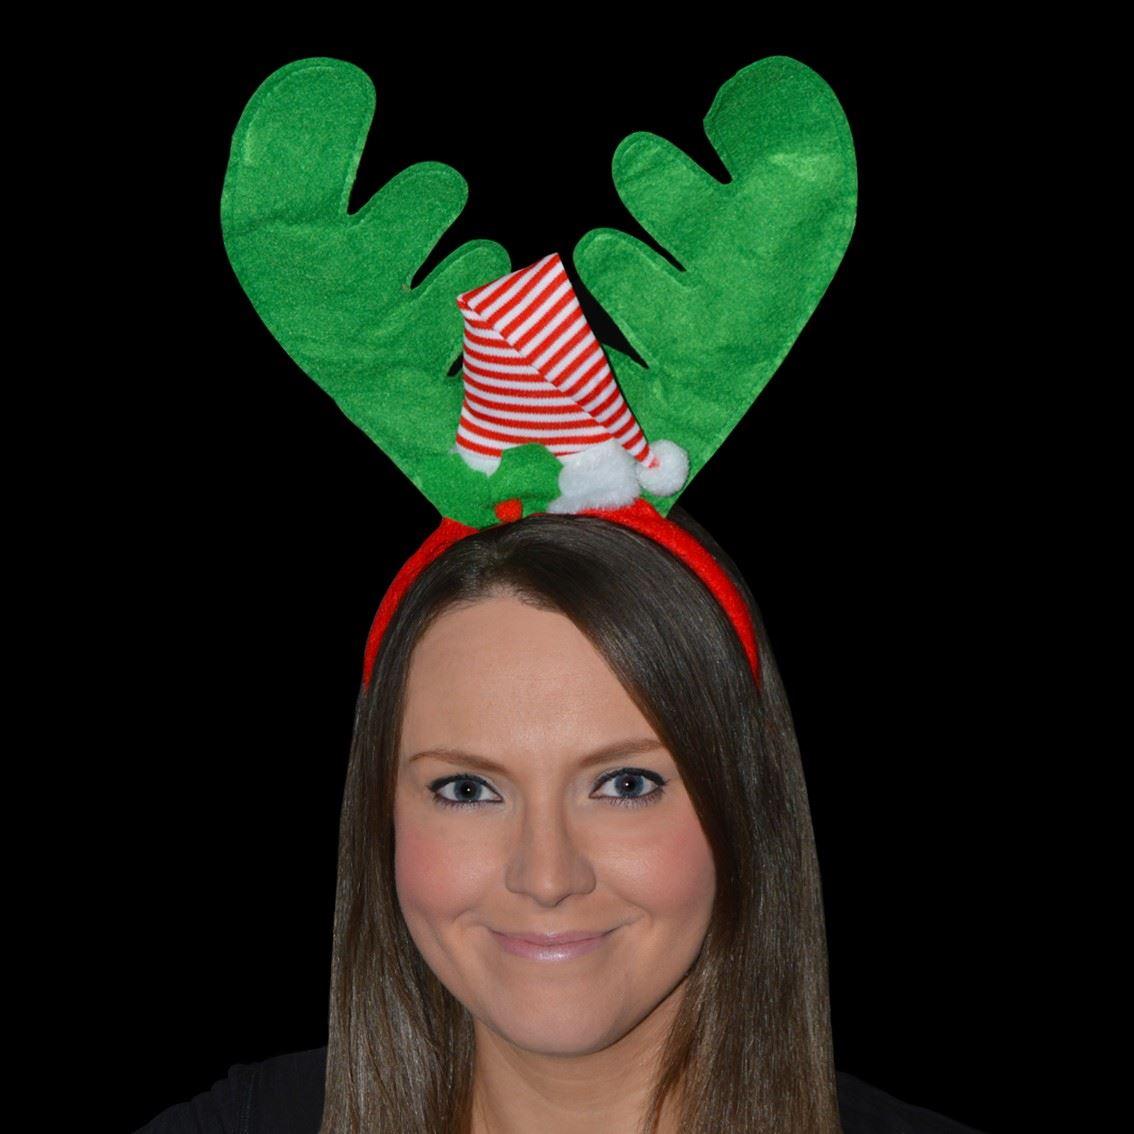 Details about christmas hats headbands fancy dress hat turkey reindeer